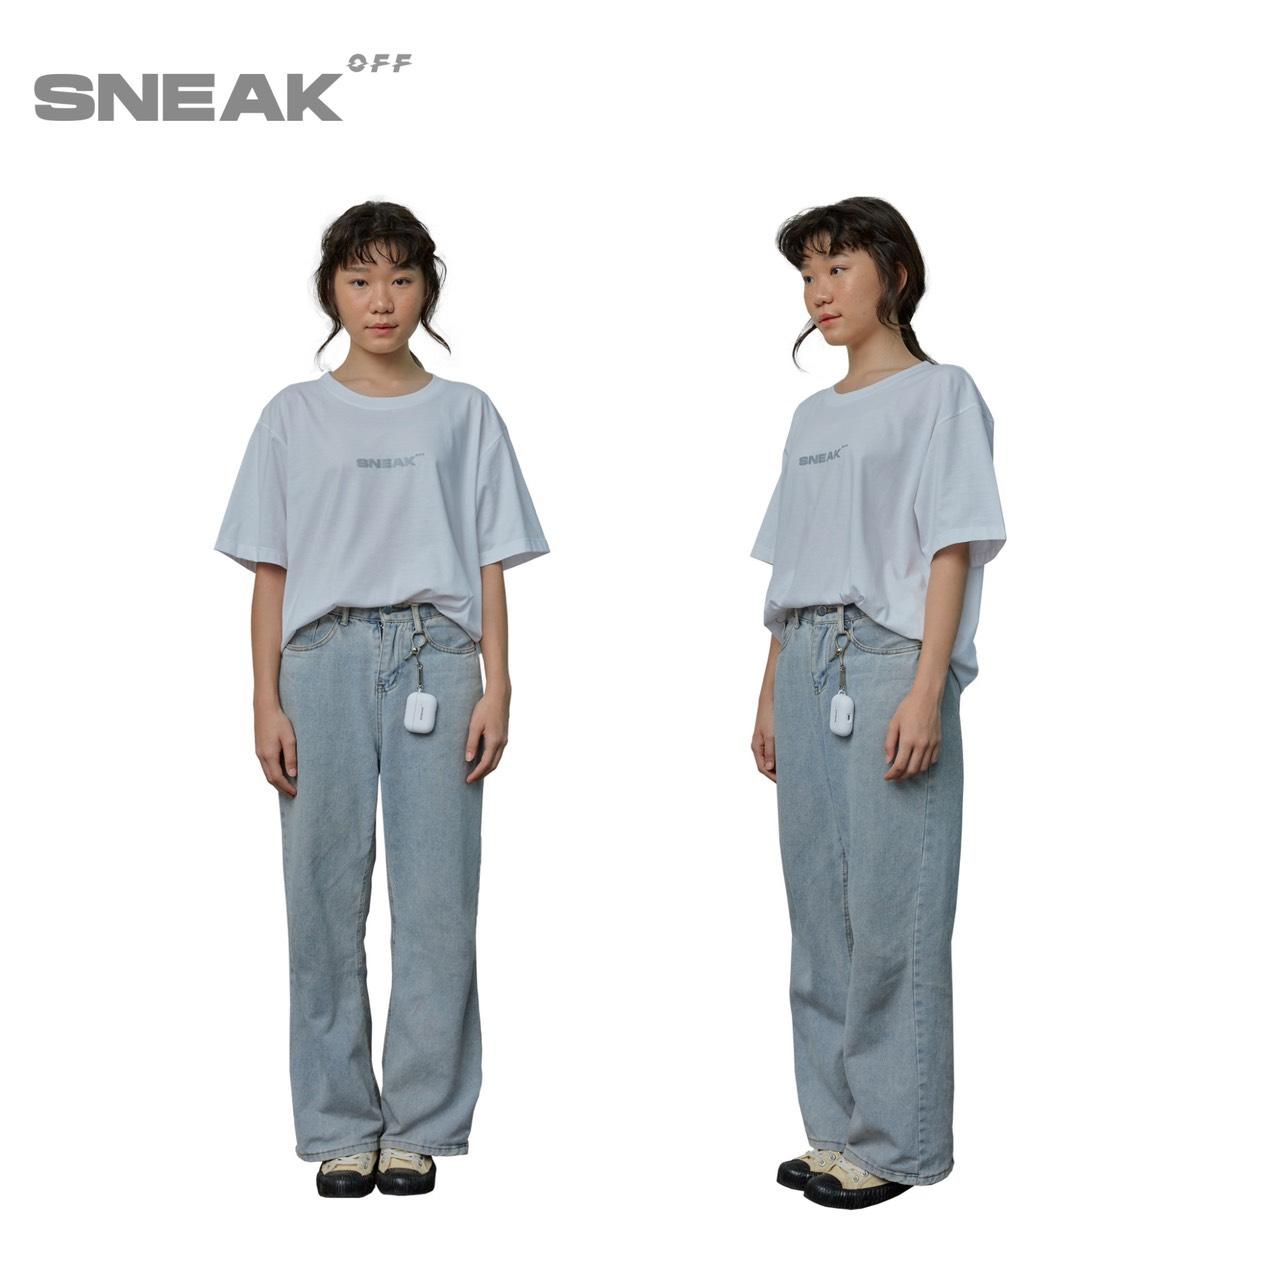 SUP.SNEAK SNEAK-OFF REFLECT TEE WHITE